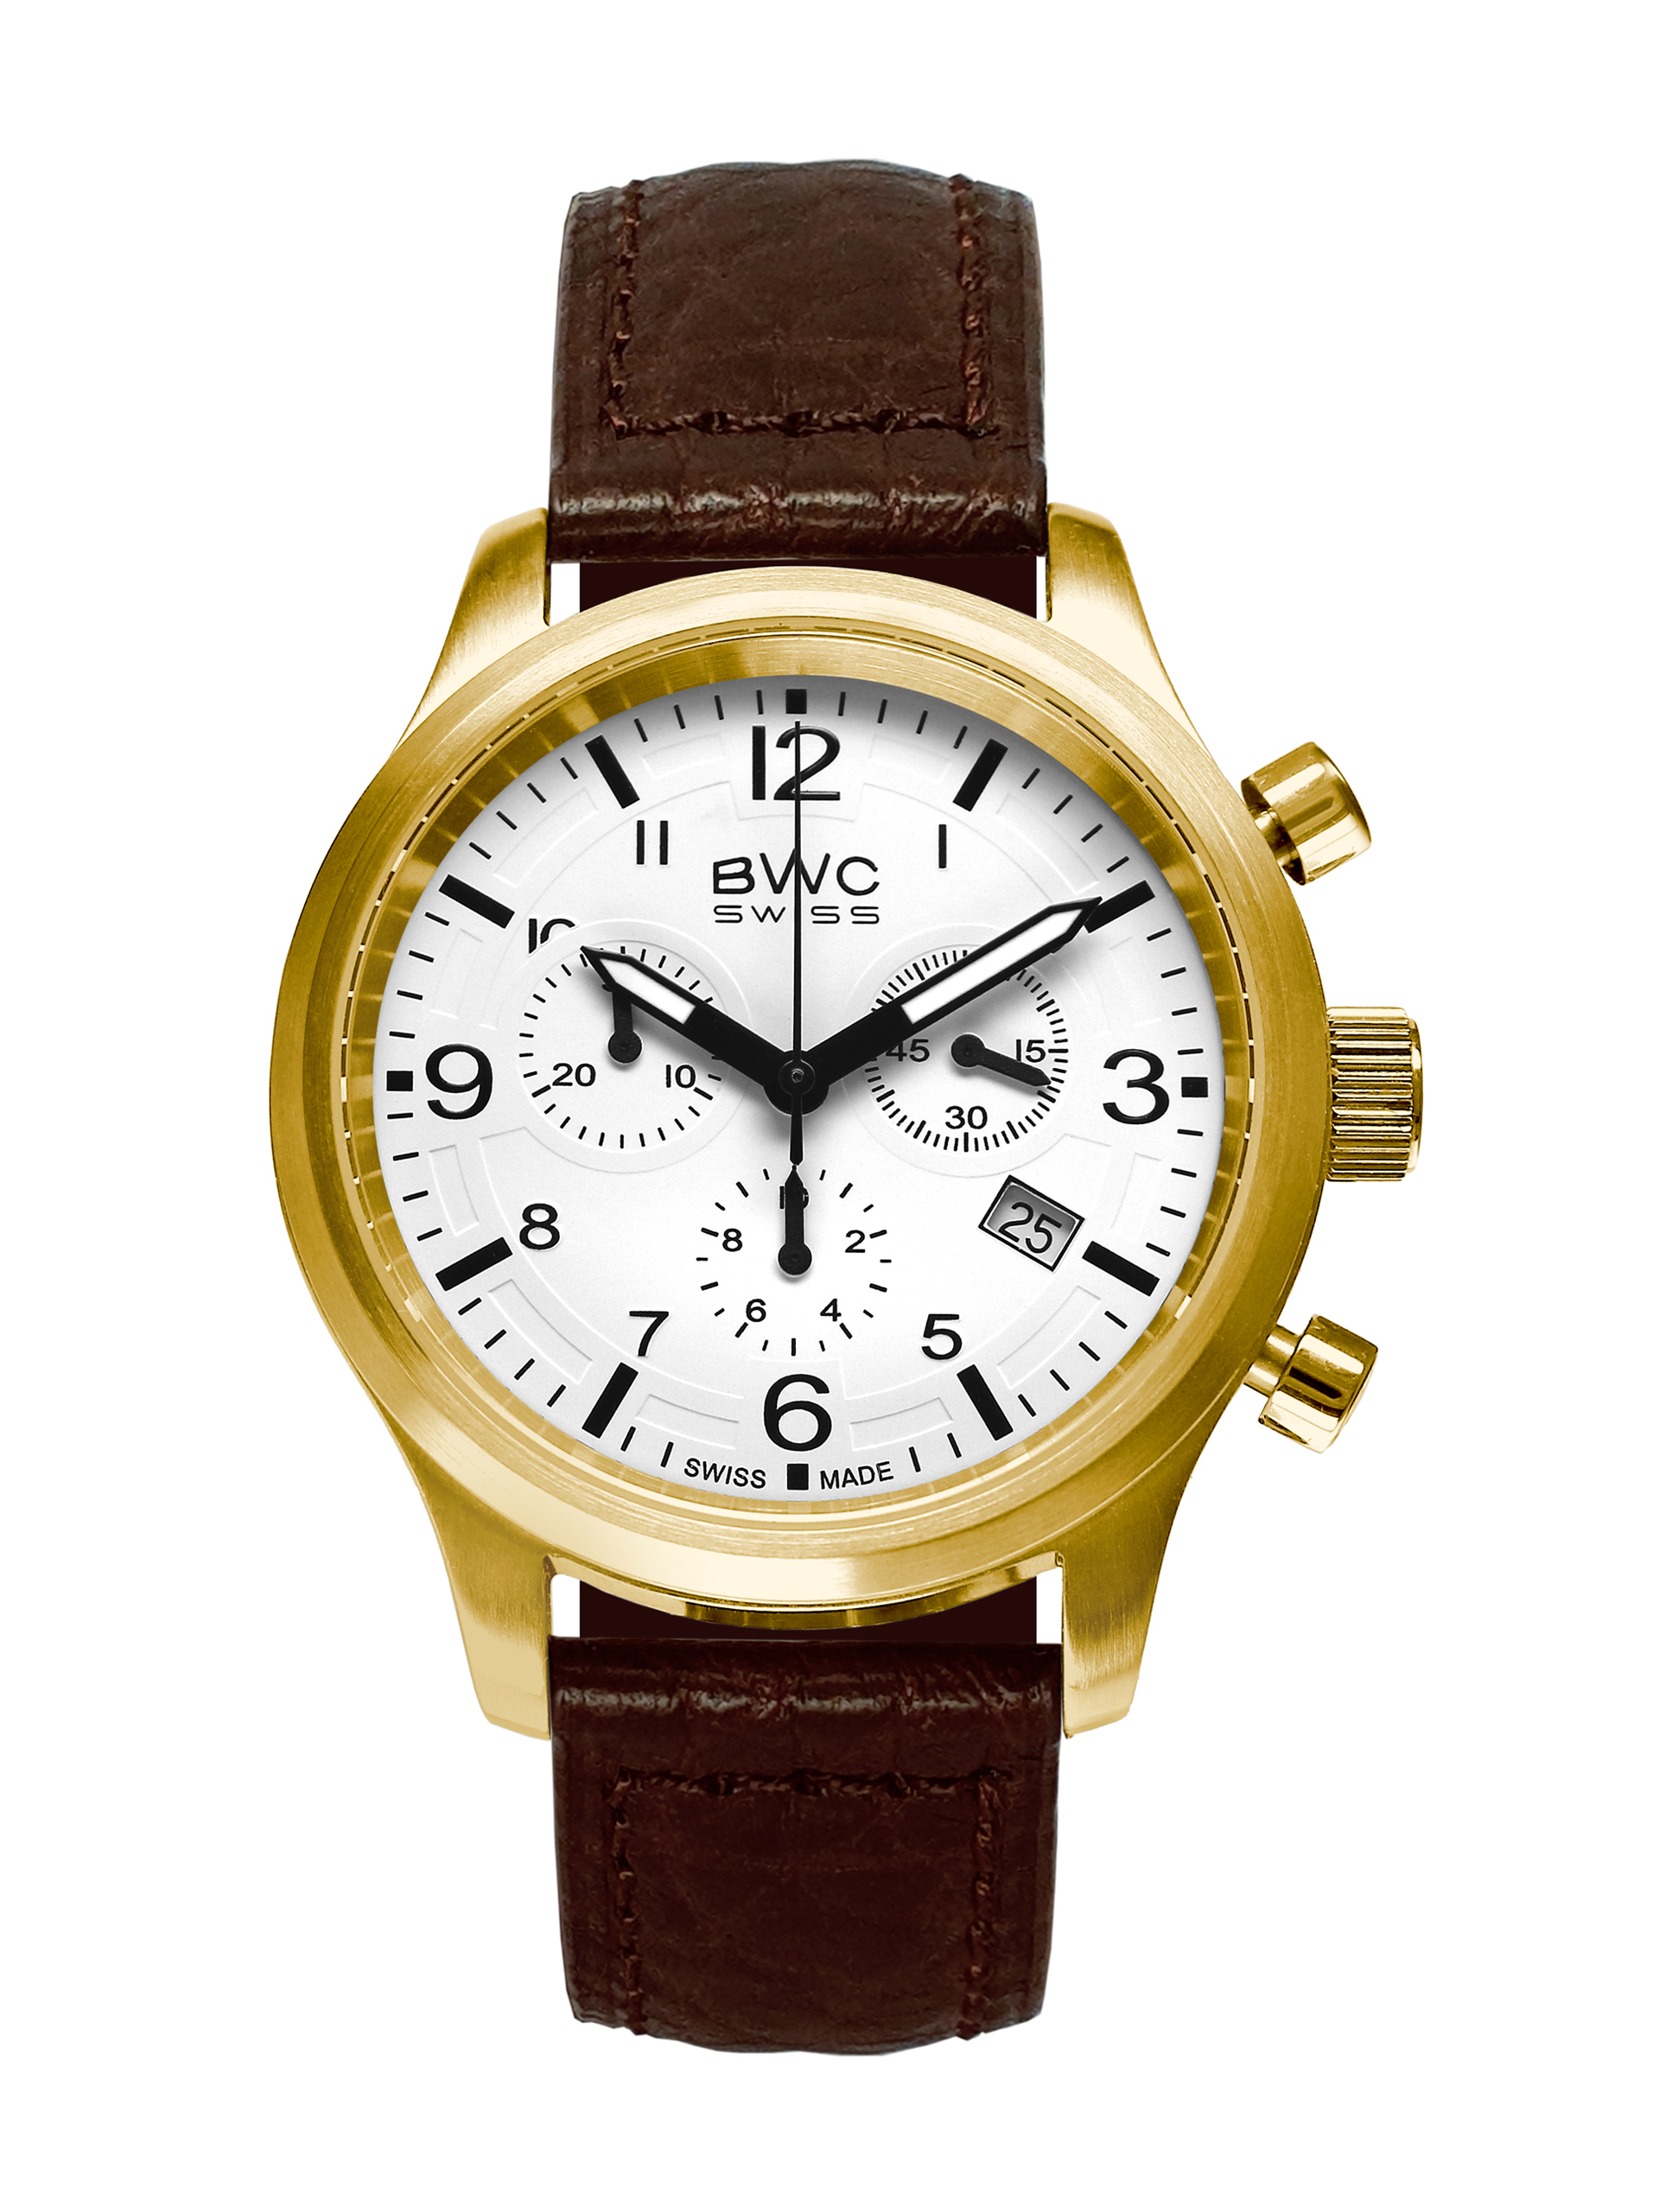 BWC-Swiss Quarz-Chronograph Ronda 5040.D 20017.51.51